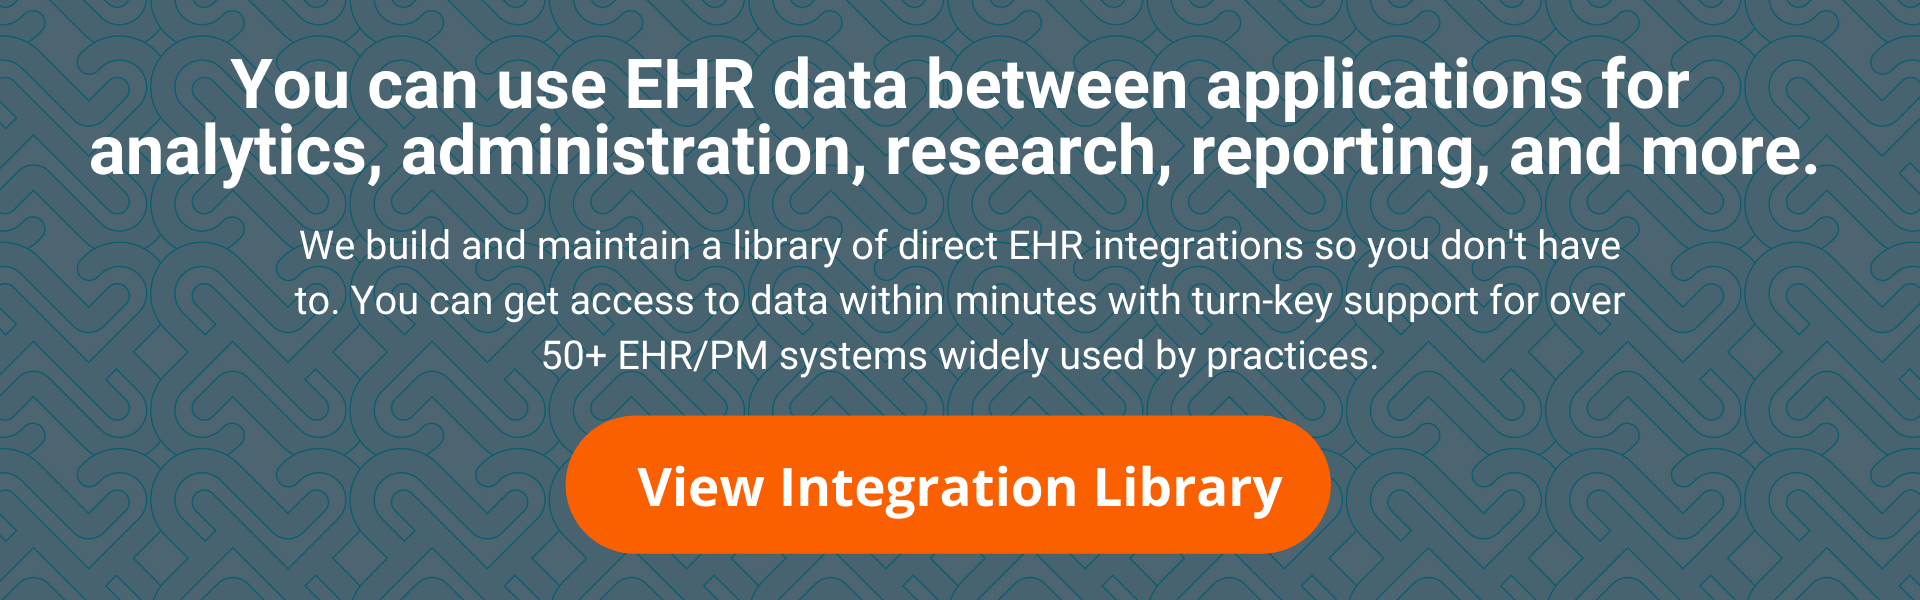 Healthjump Integration Library